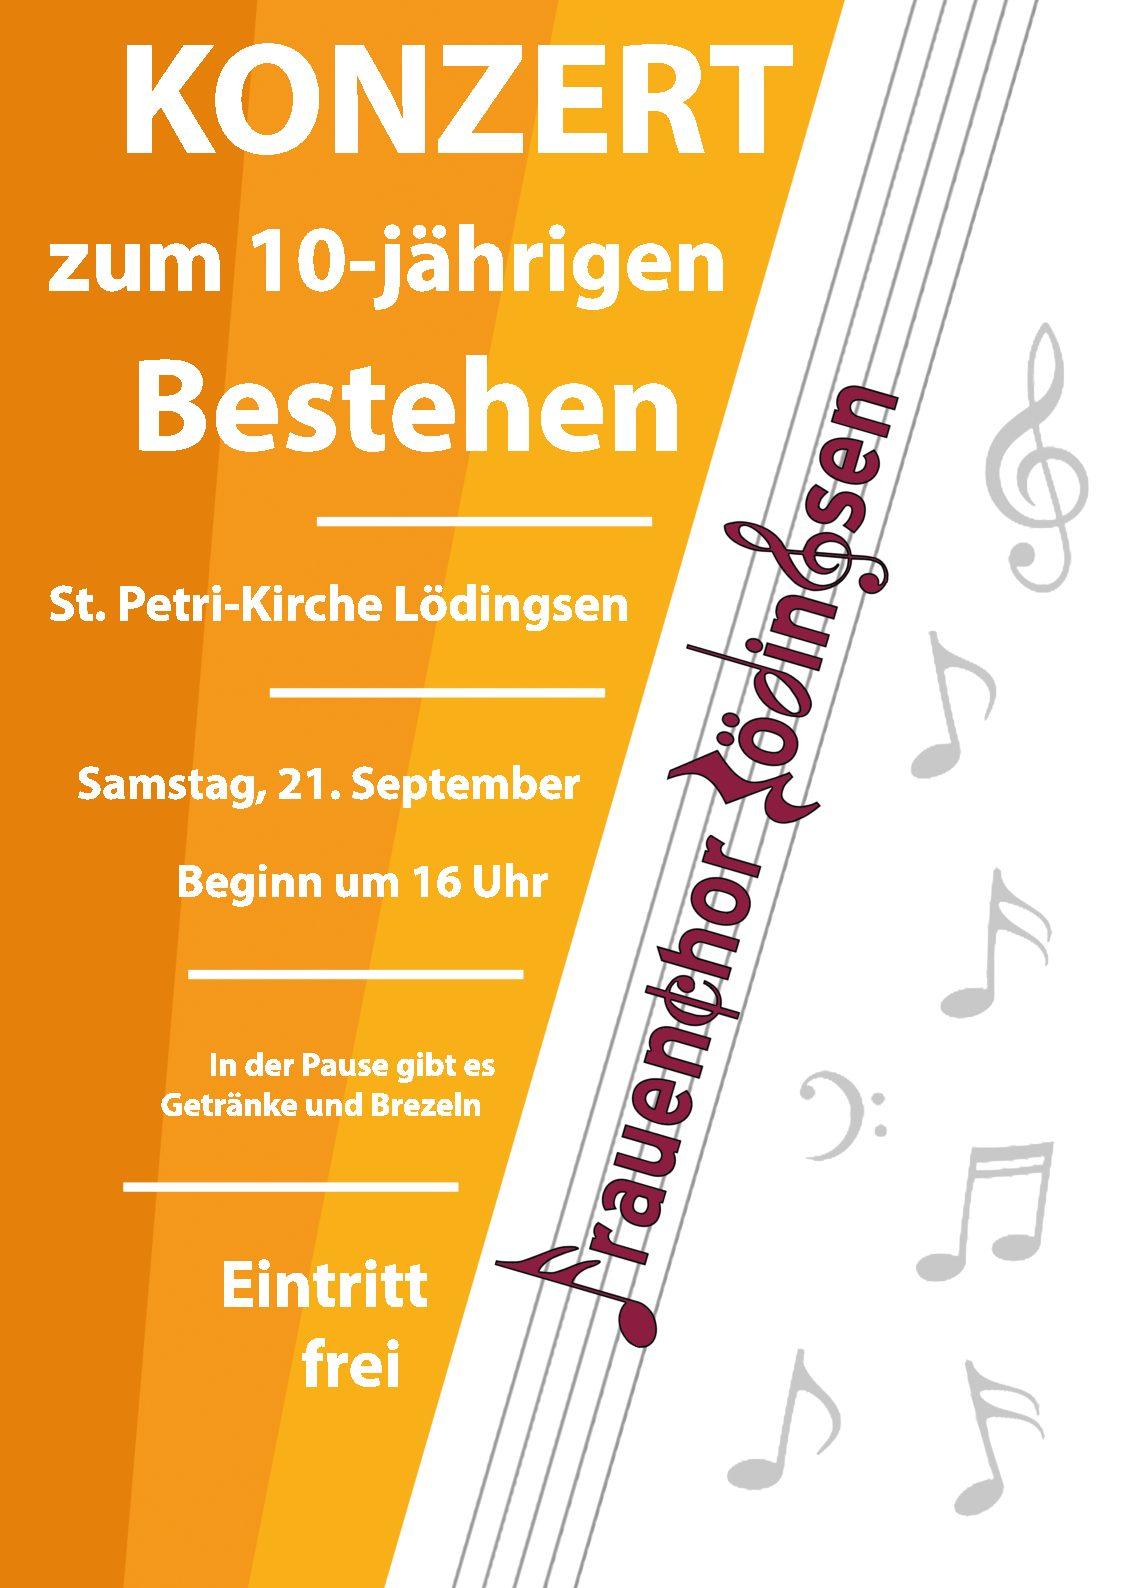 Frauenchor Konzert 19